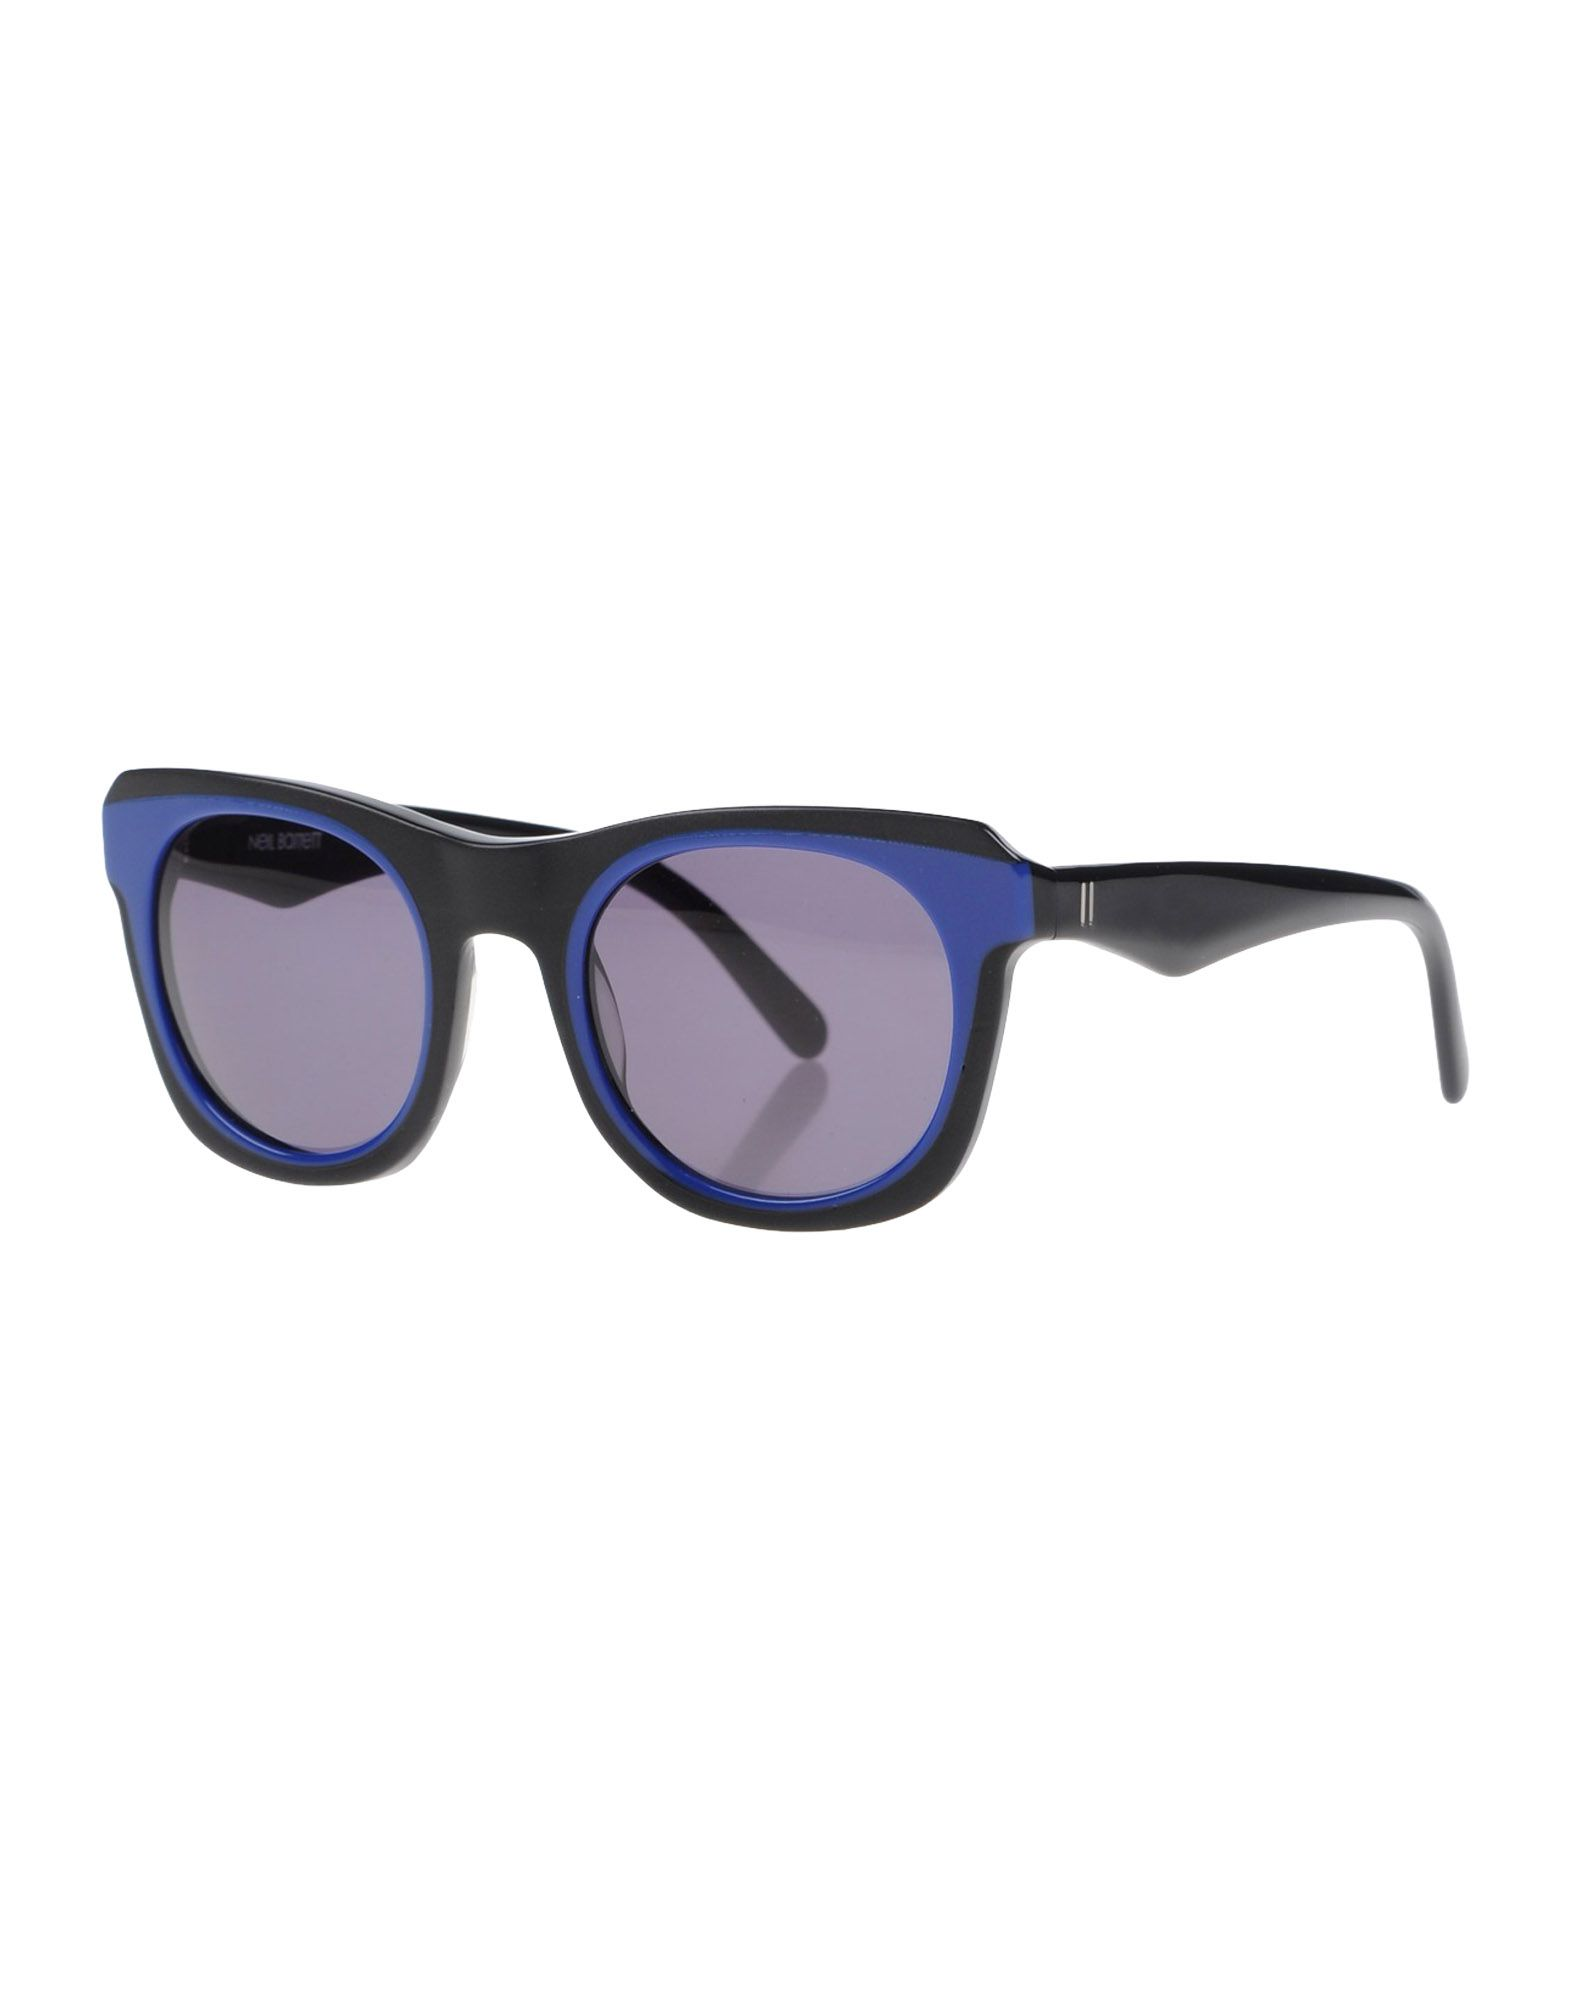 NEIL BARRETT Солнечные очки очки рисунок